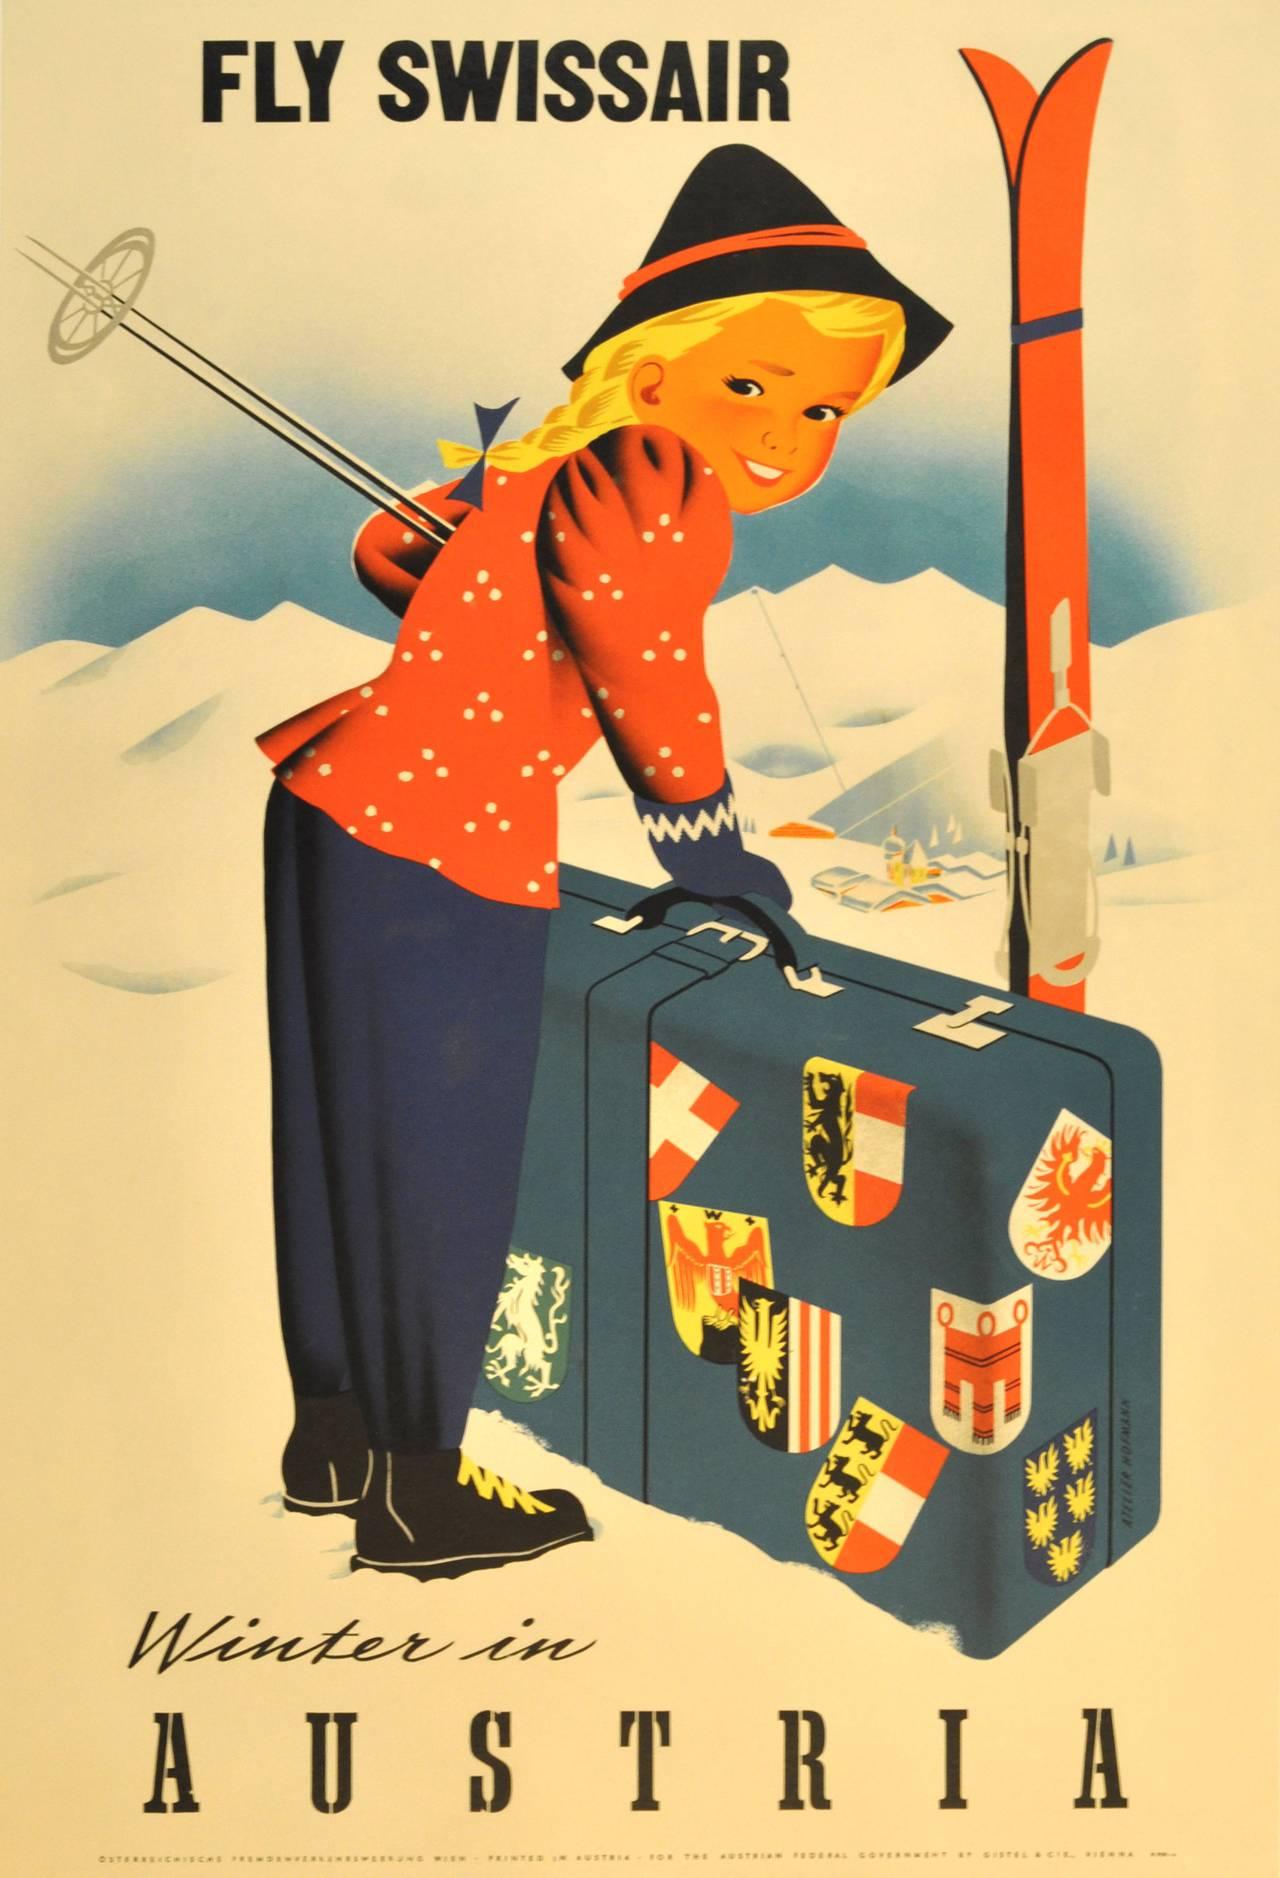 Original vintage ski poster promoting winter sports in Austria, Fly Swissair